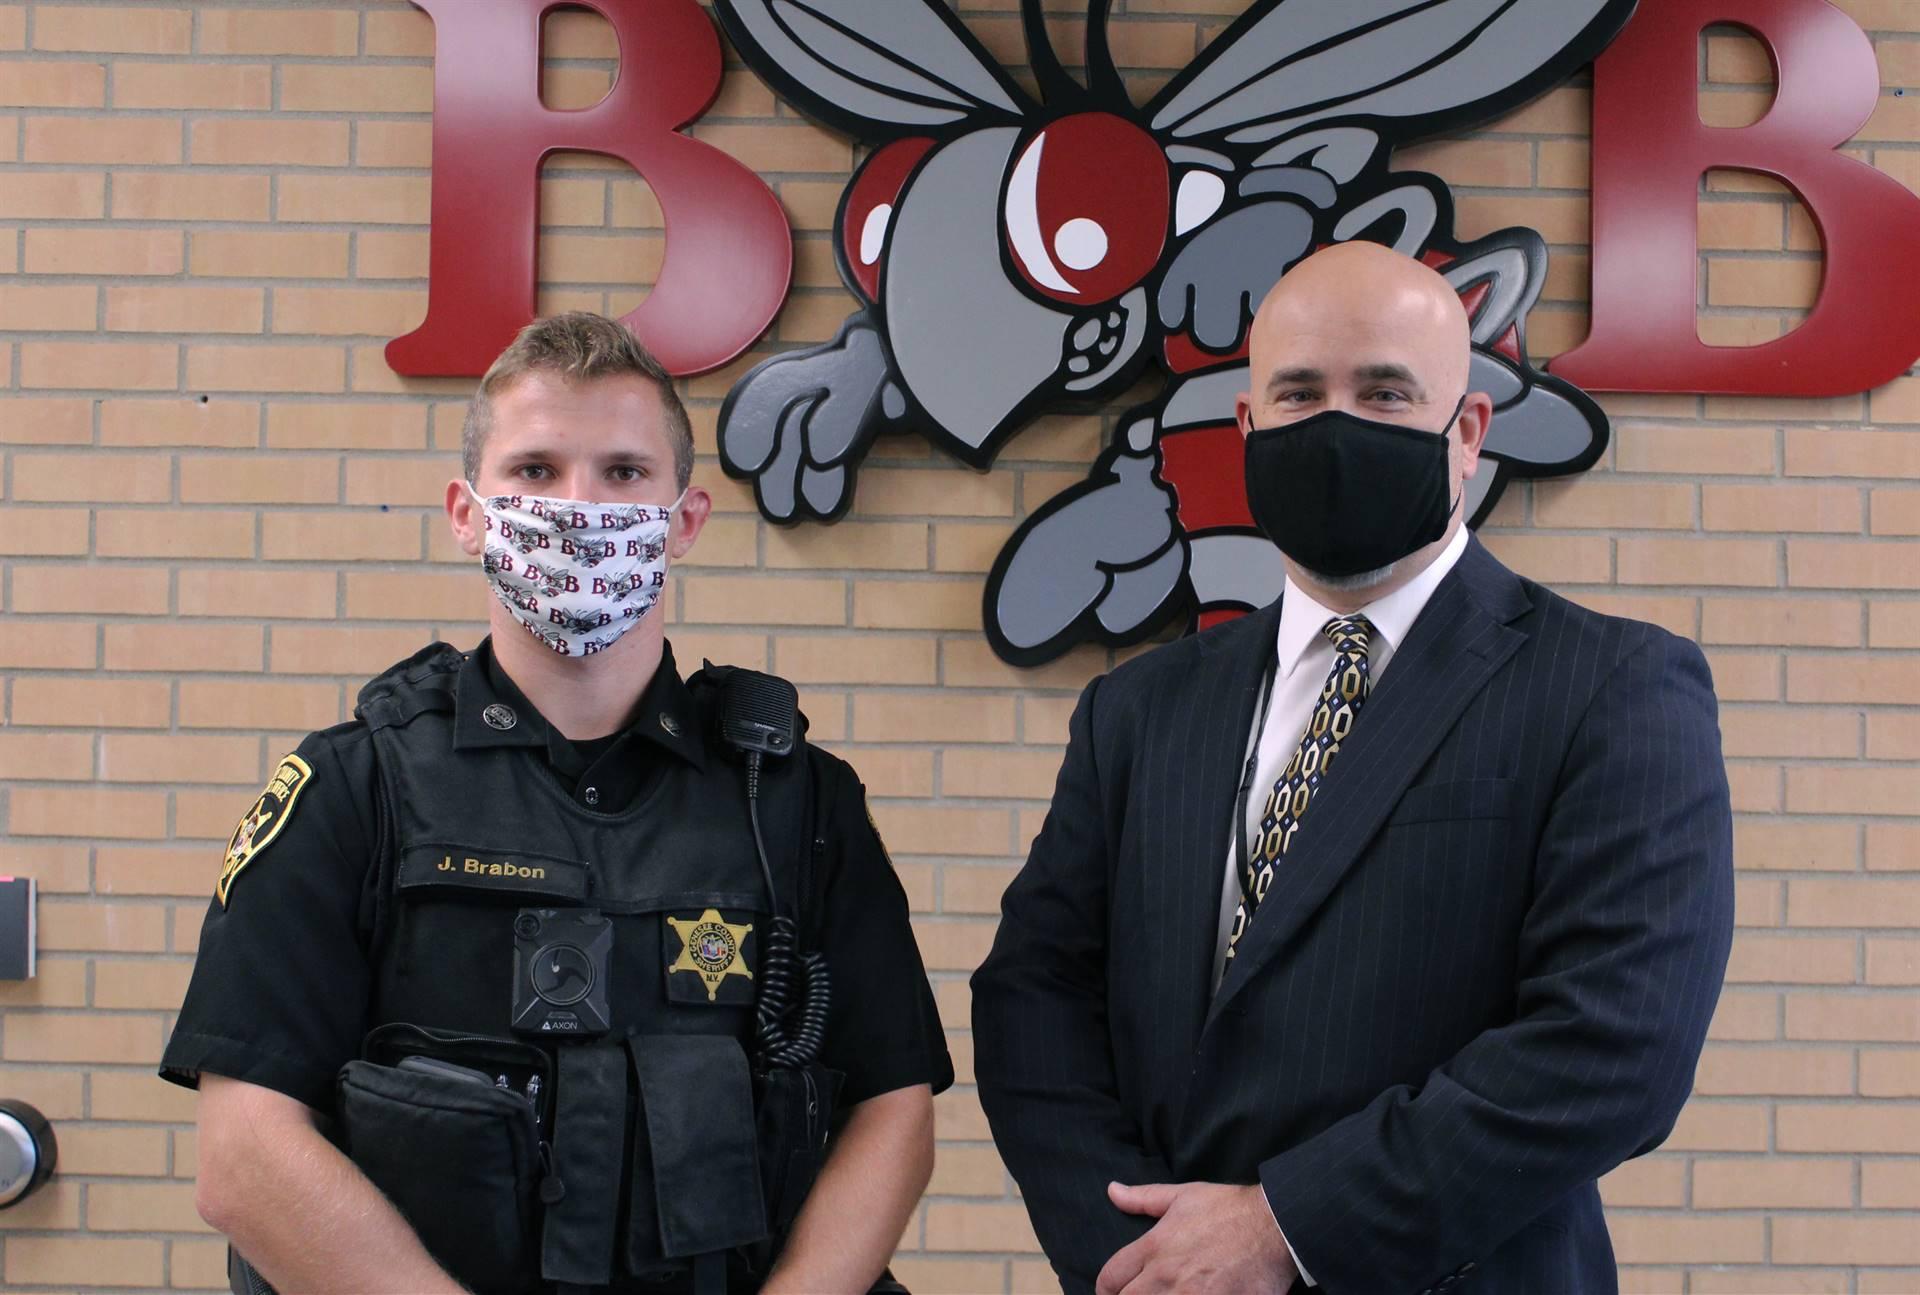 Deputy Brabon with Superintendent Edwards